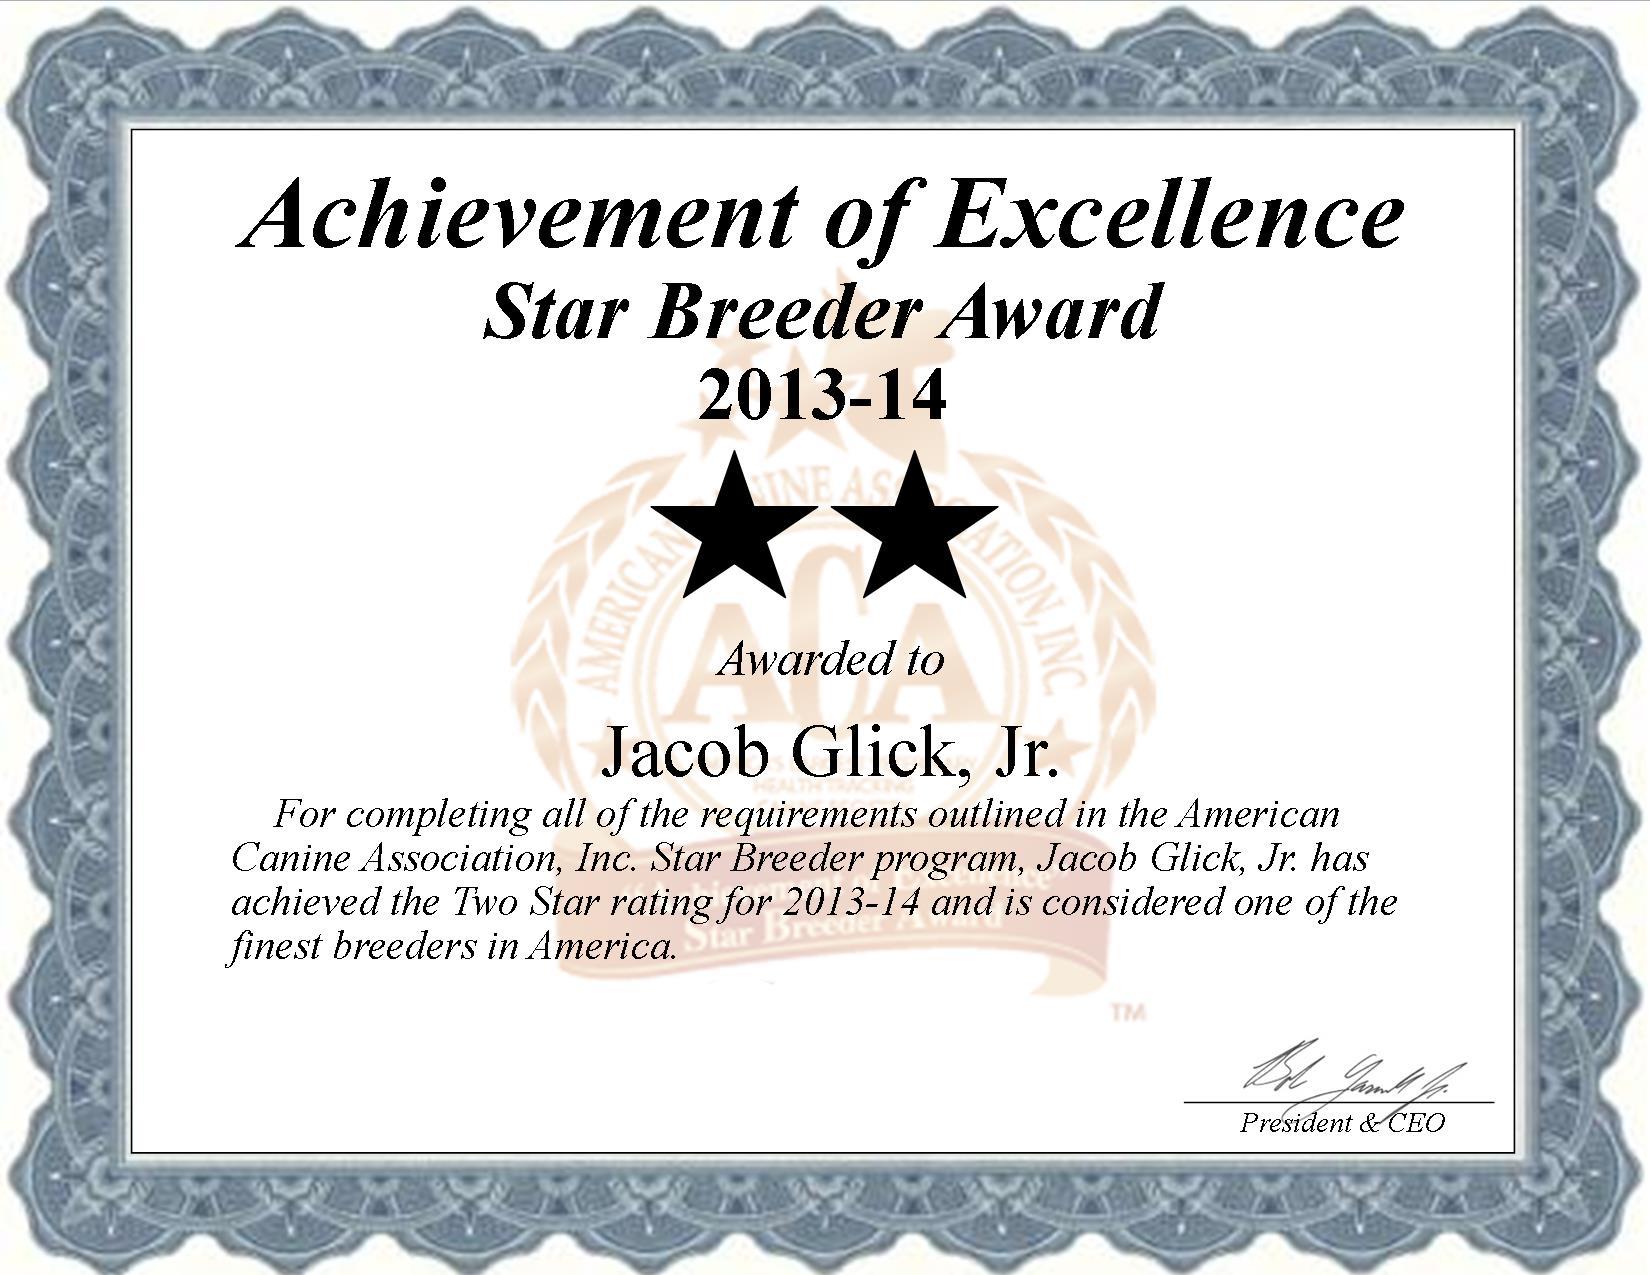 Jacob Glick, Jr., Jacob, Glick, Jr., Glick, Jr. kennel, Jacob Glick, Jr. breeder, East Earl, PA Pennsylvania, east earl pa, breeder, star breeder, 5 star breeders,  starbreeder, starbreeders, 2 star, dog, puppy, puppies